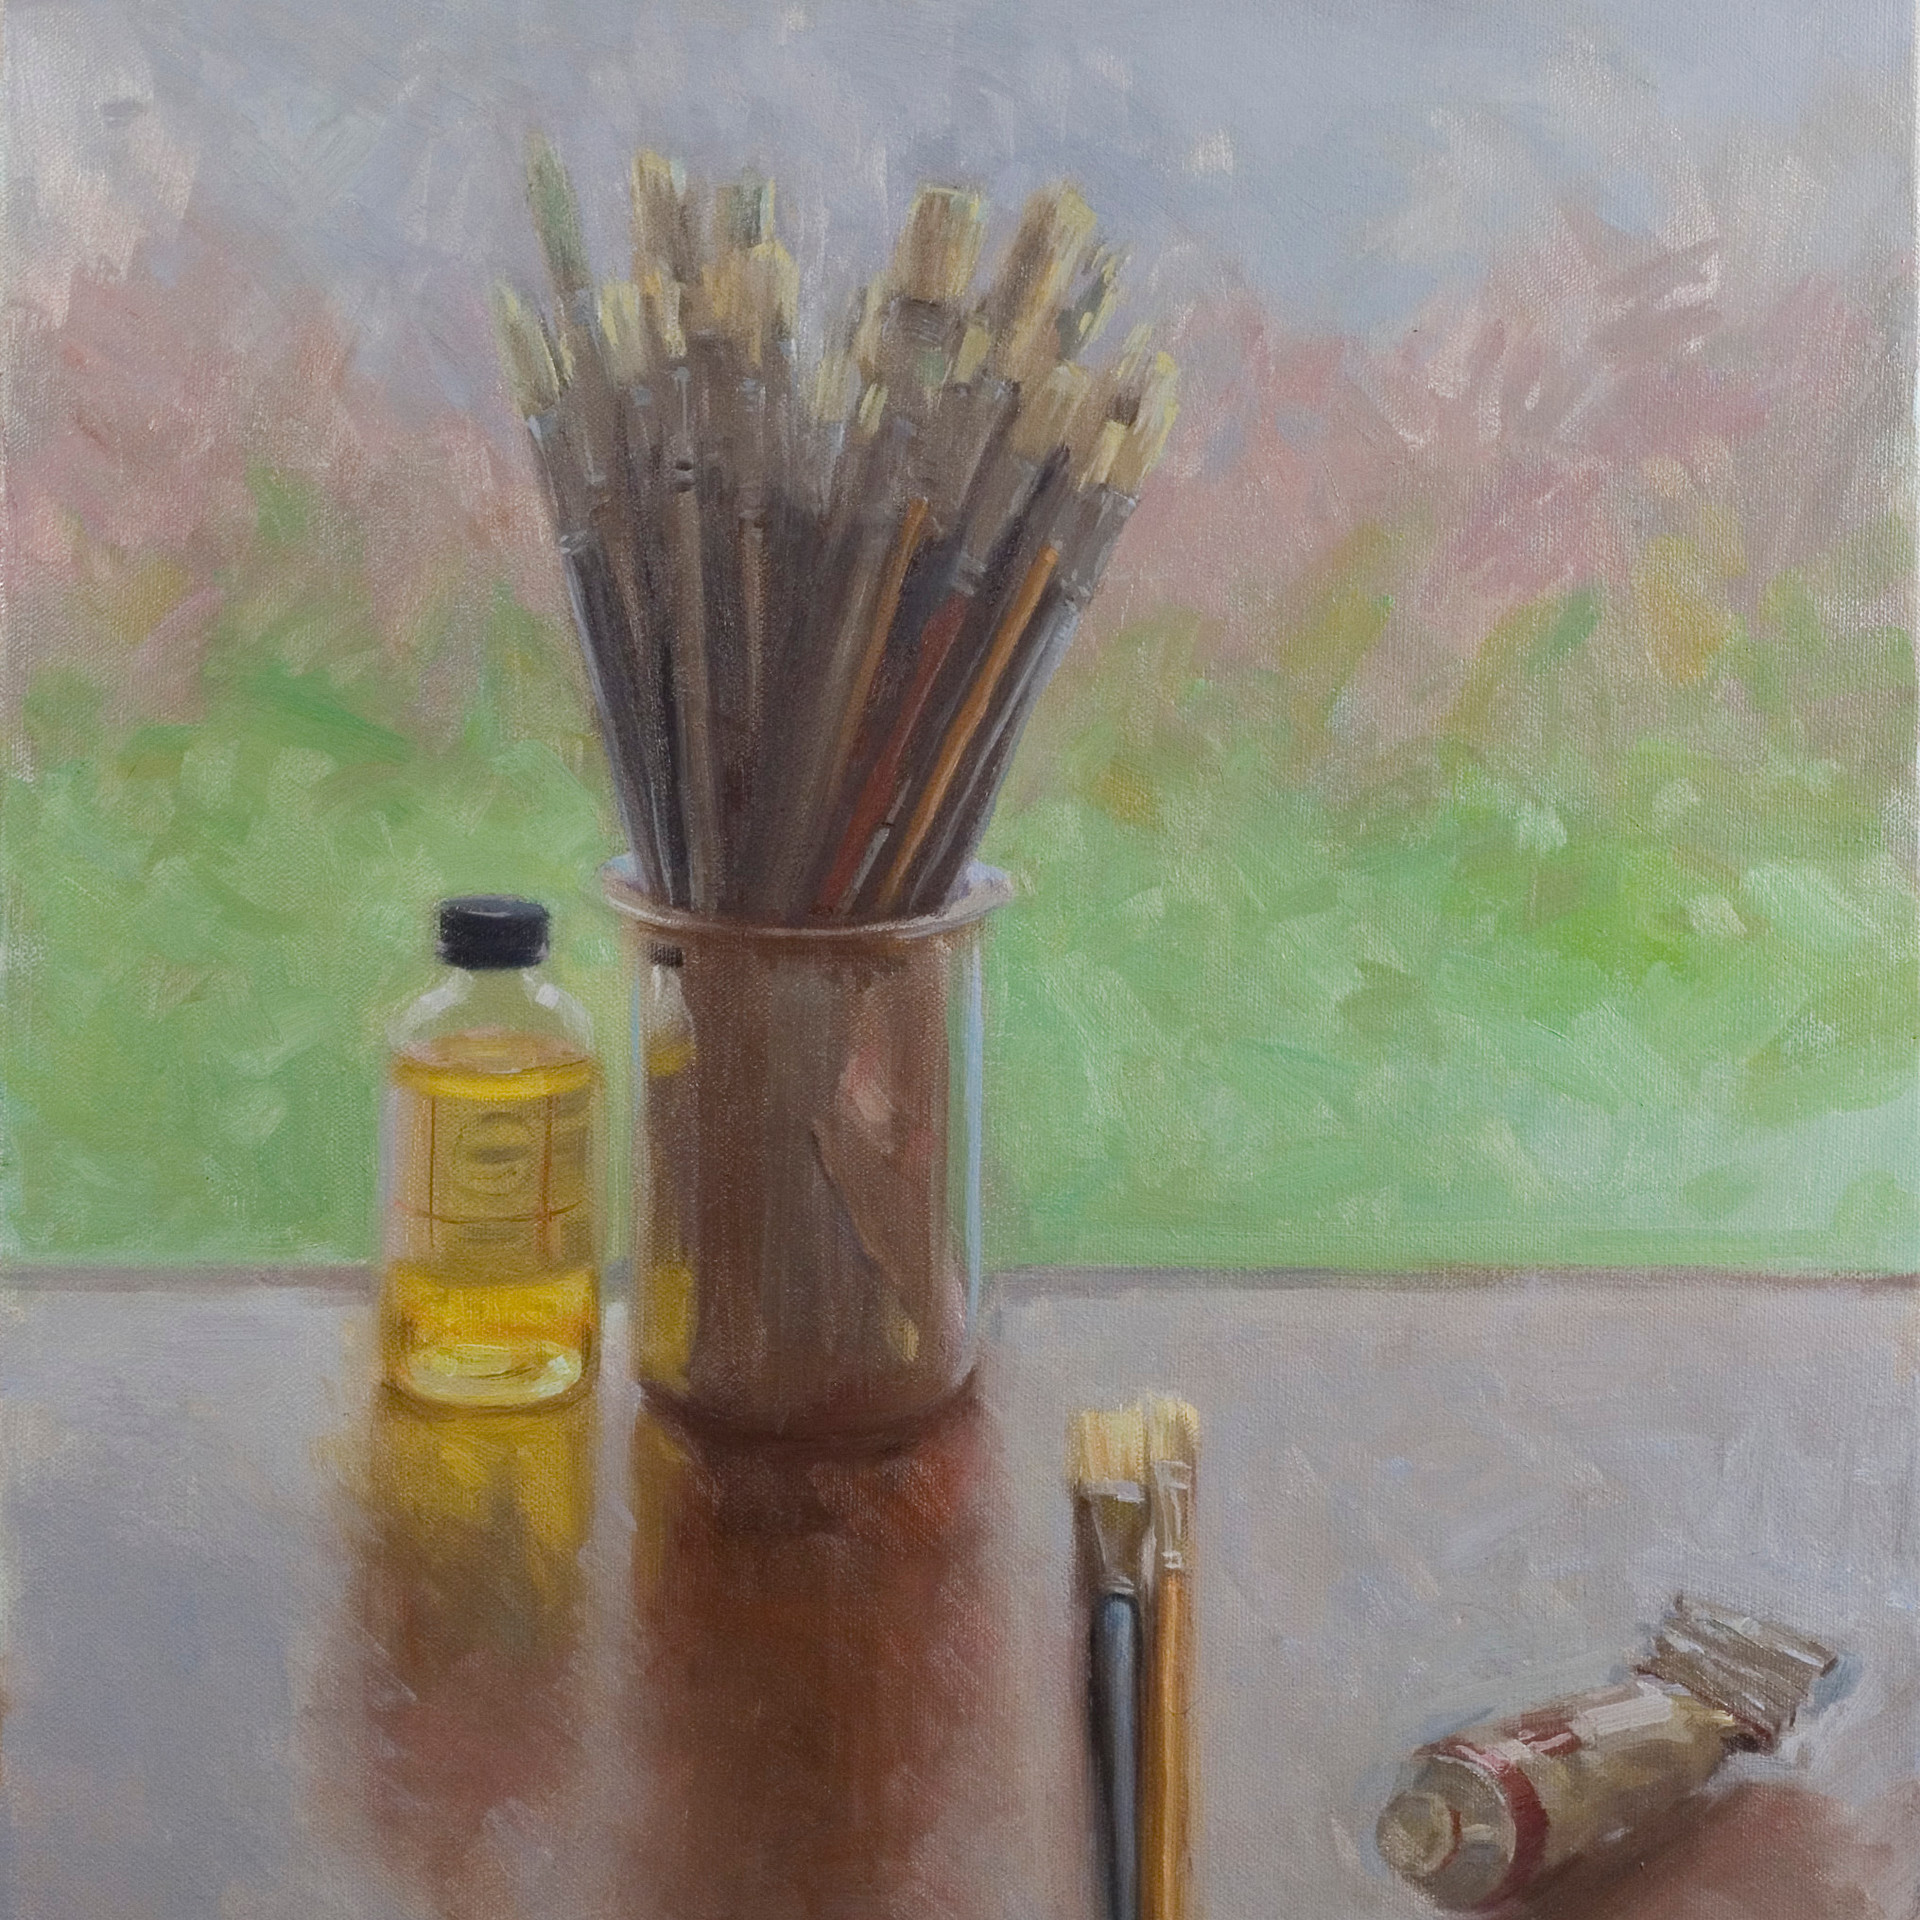 back lit brushes